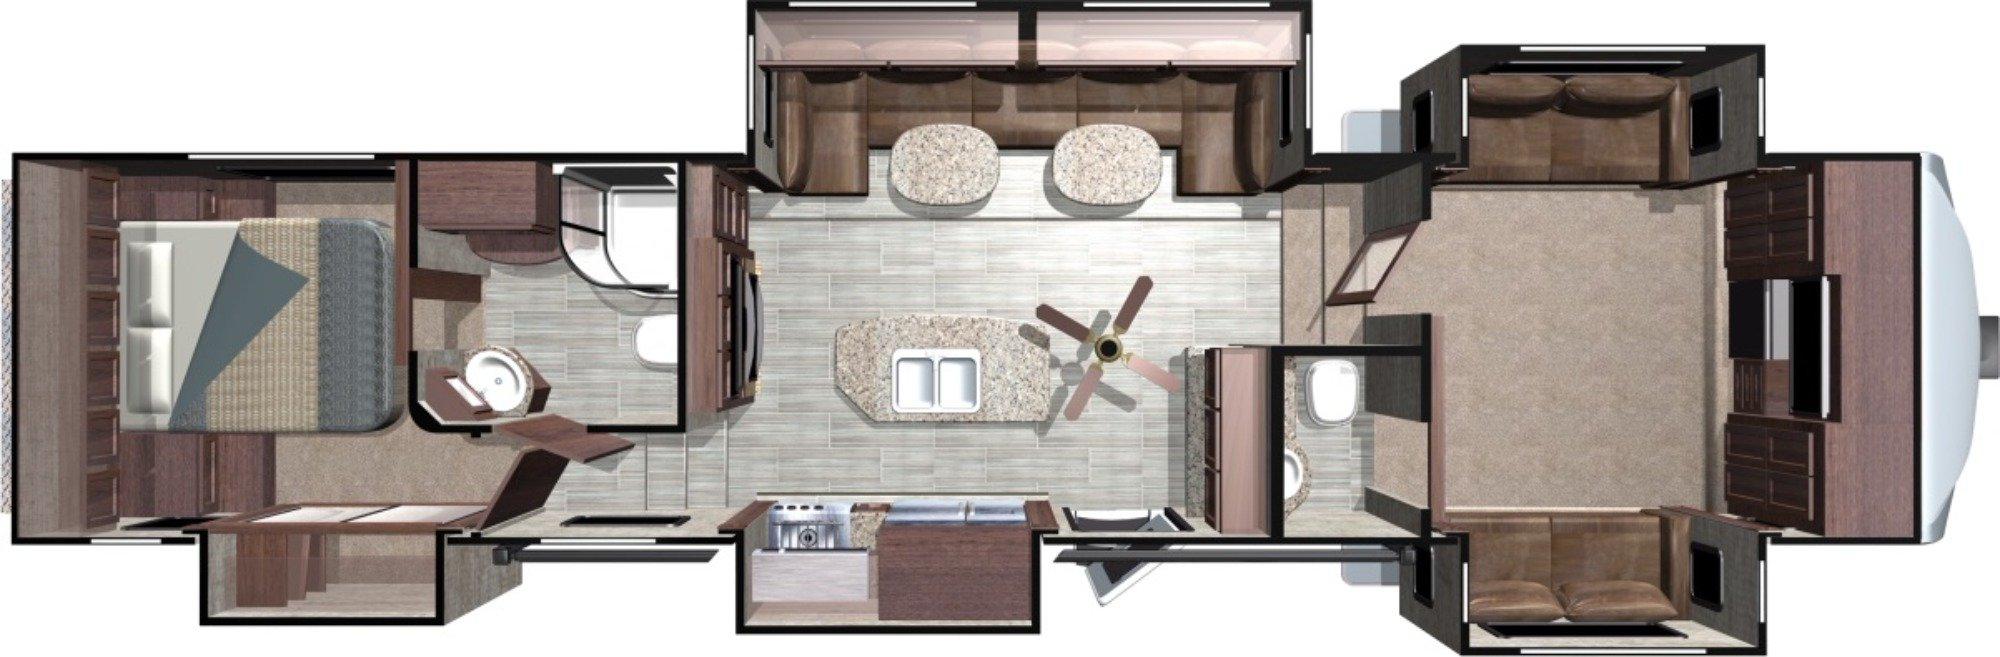 View Floor Plan for 2018 HIGHLAND RIDGE MESA RIDGE 376FBH